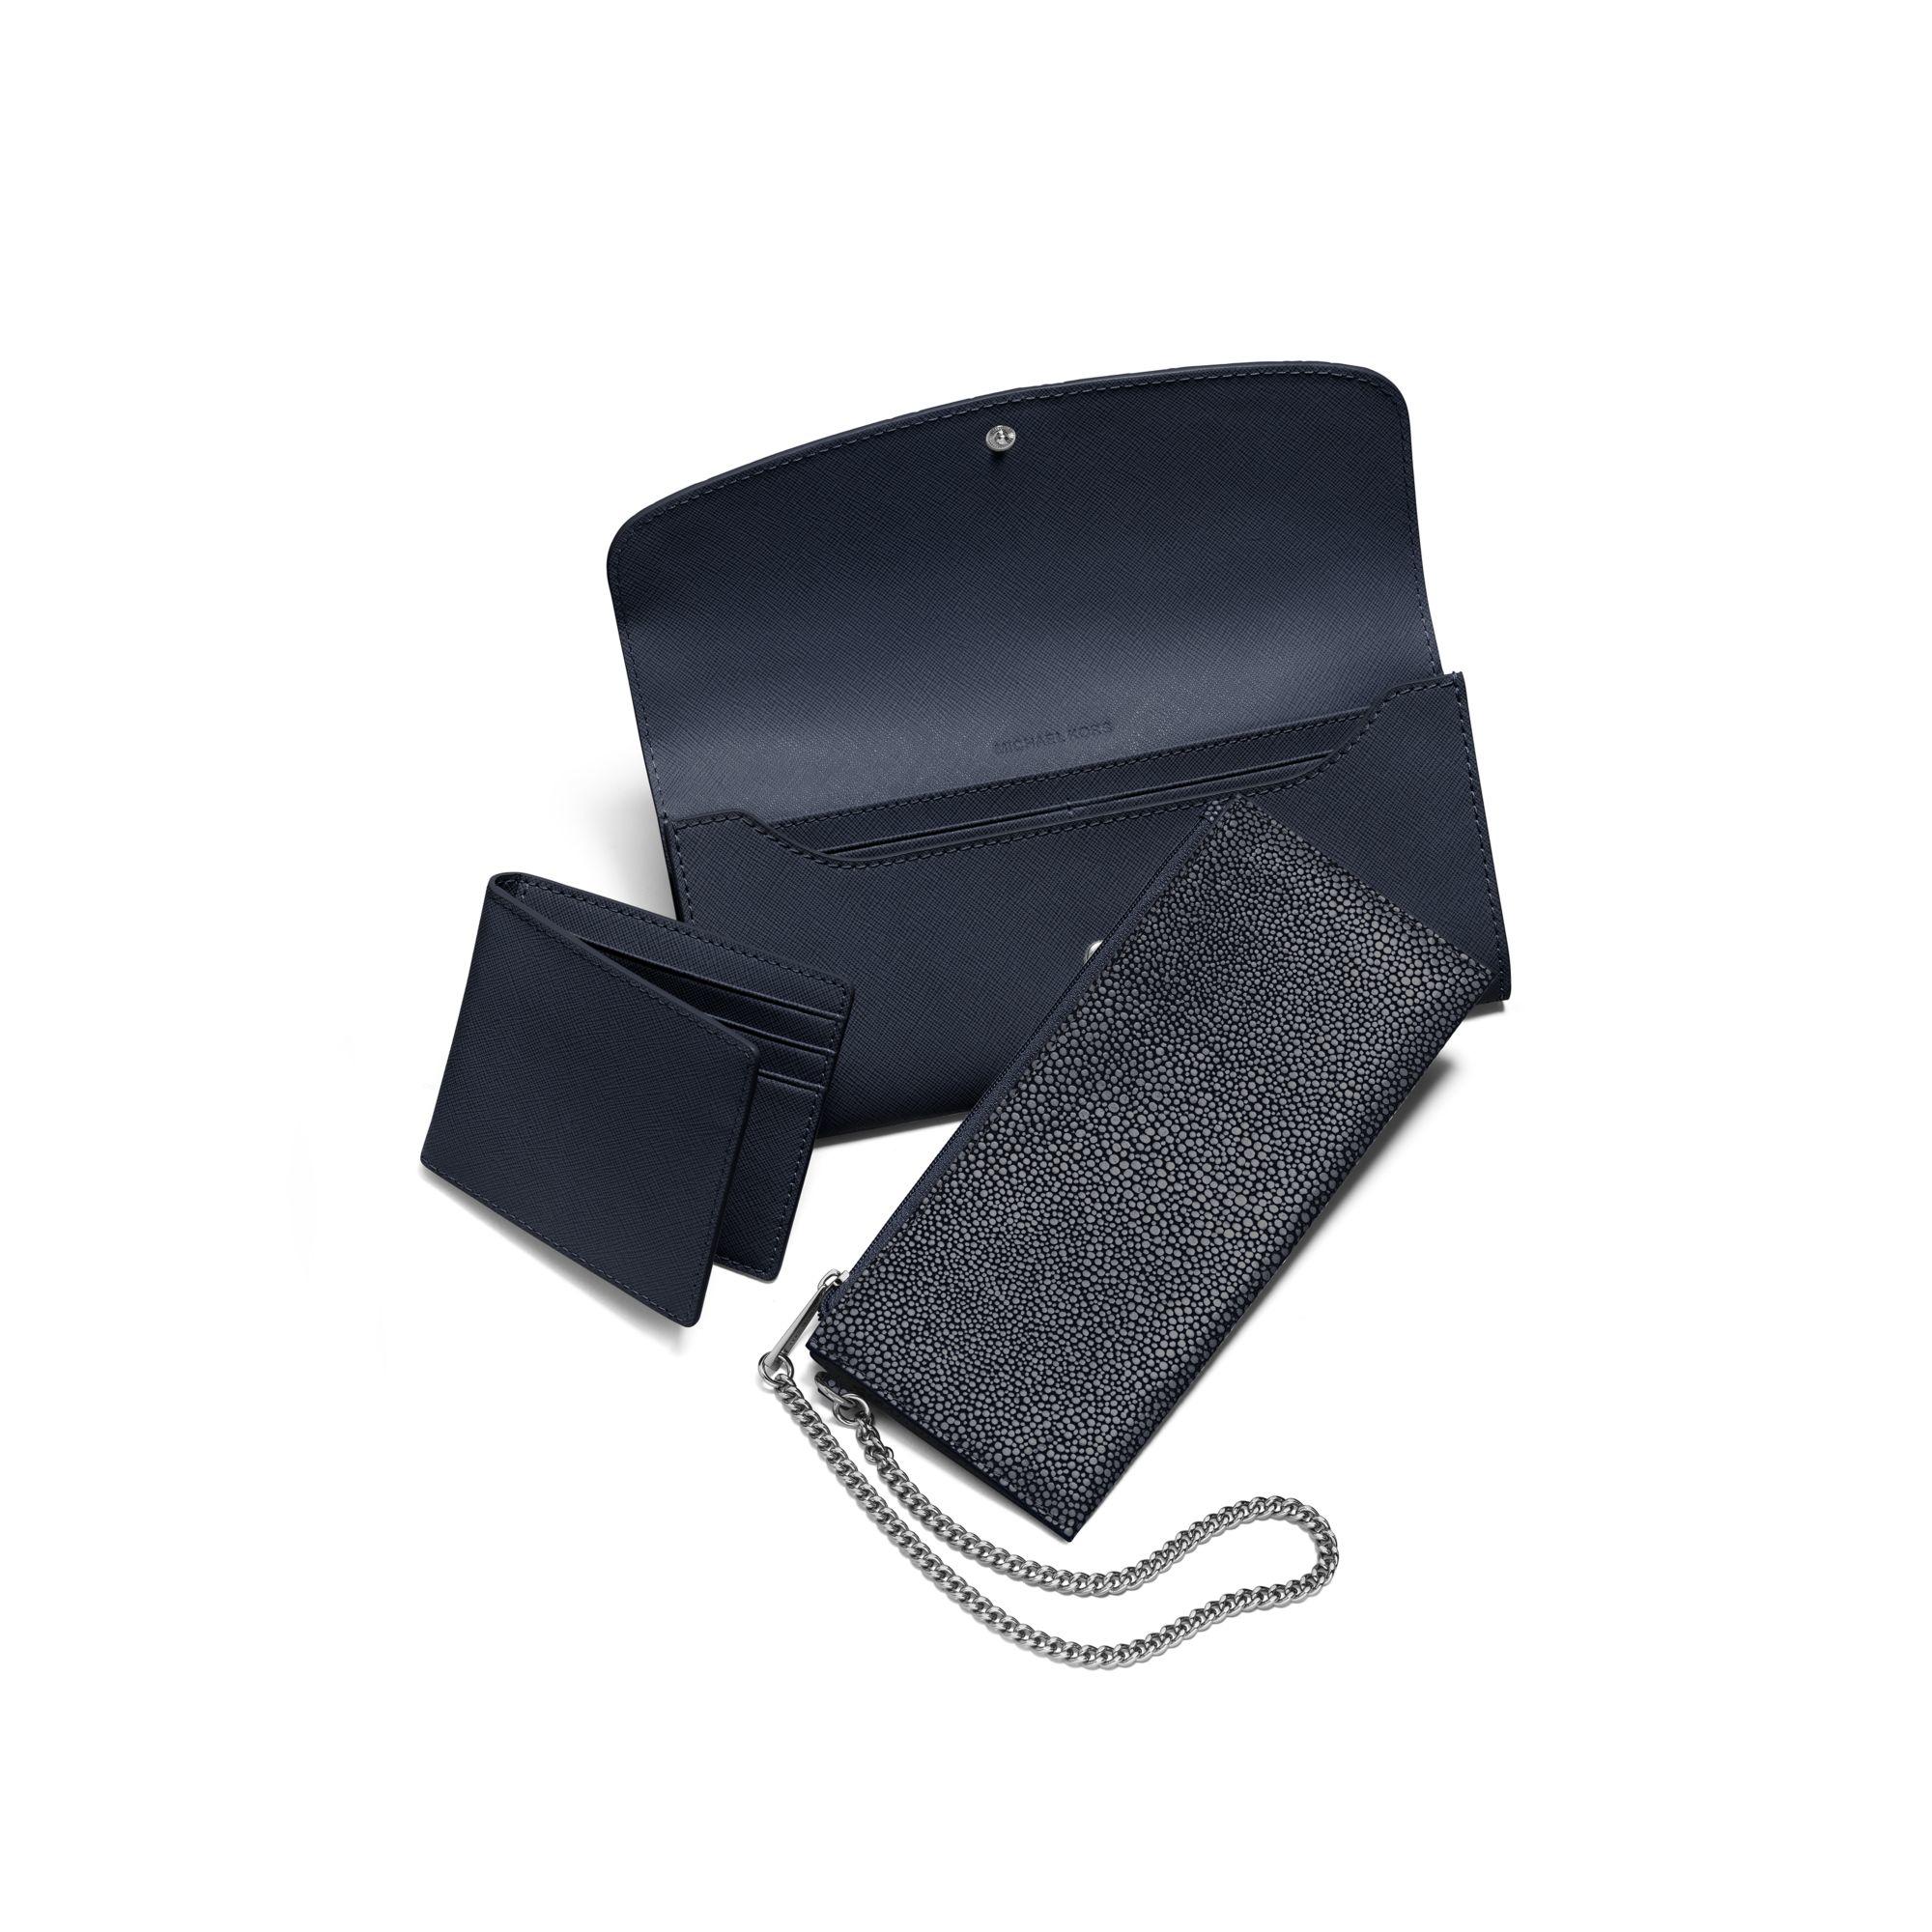 88abff3ecb83 Lyst - Michael Kors Juliana Large 3-in-1 Saffiano Leather Wallet in ...